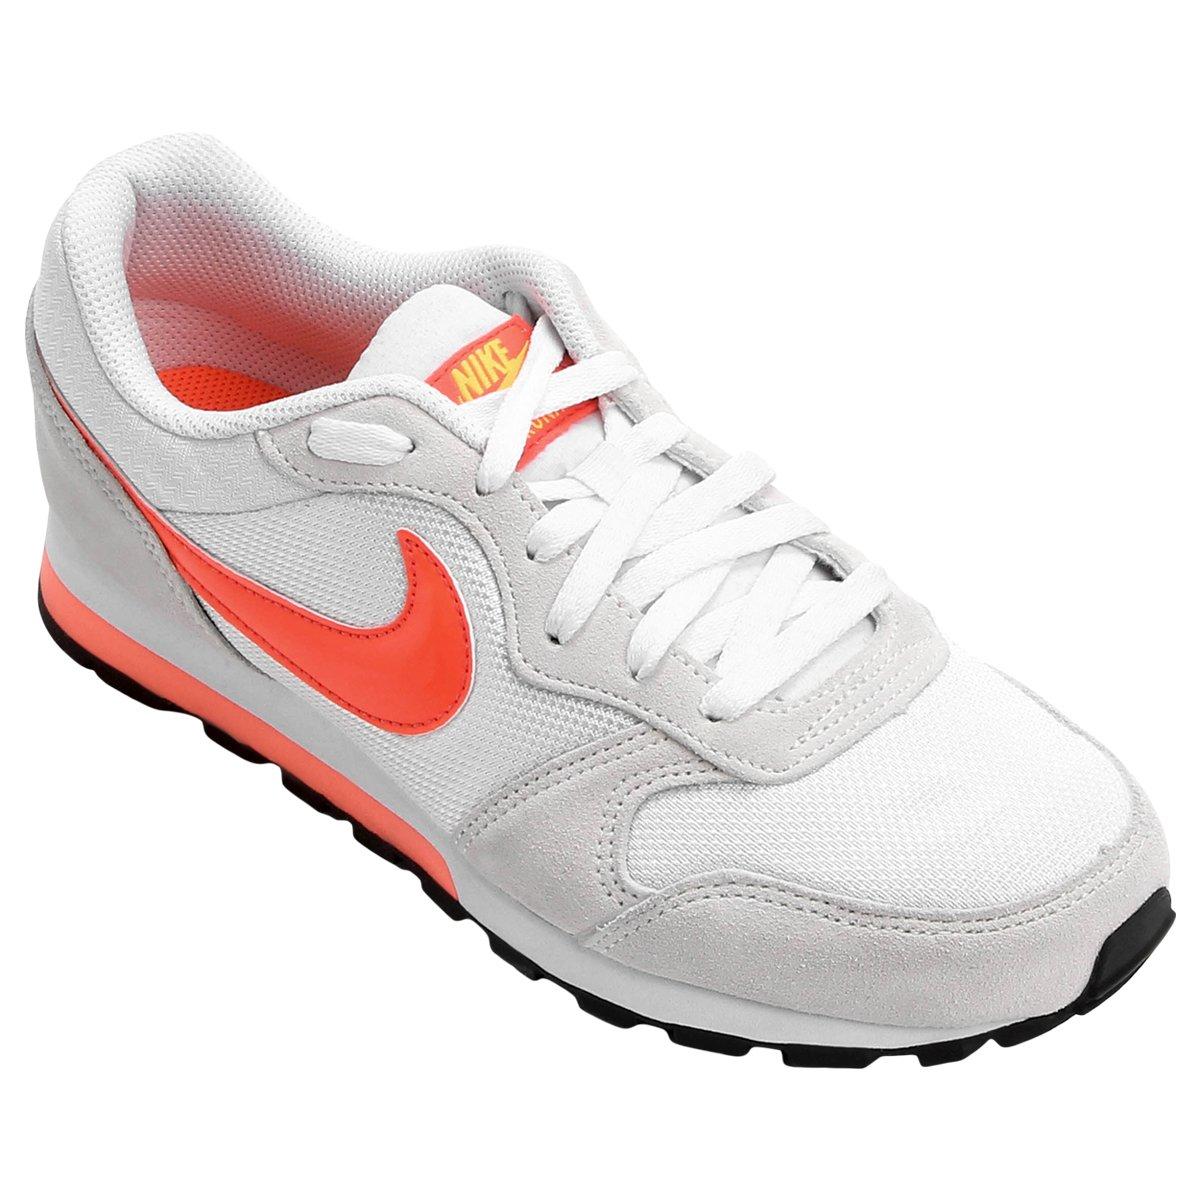 73b60a3cfc088 Tênis Nike Md Runner 2 Feminino - Branco e Laranja | Loja do Inter